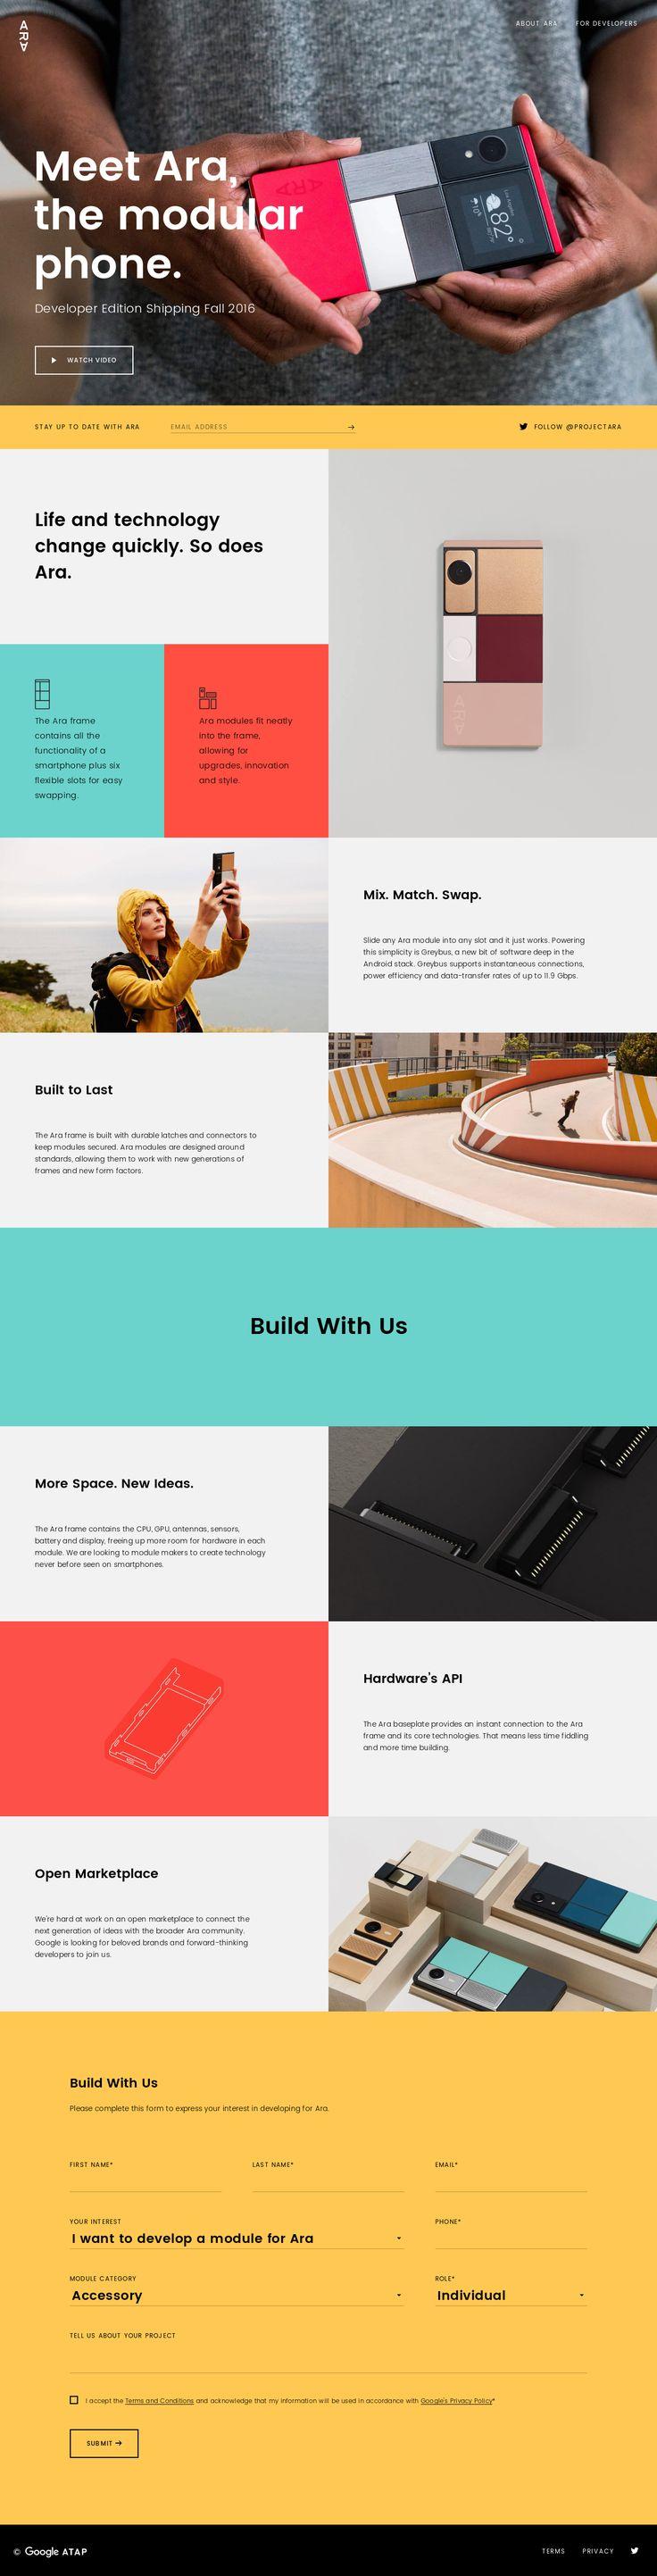 ARA website layout